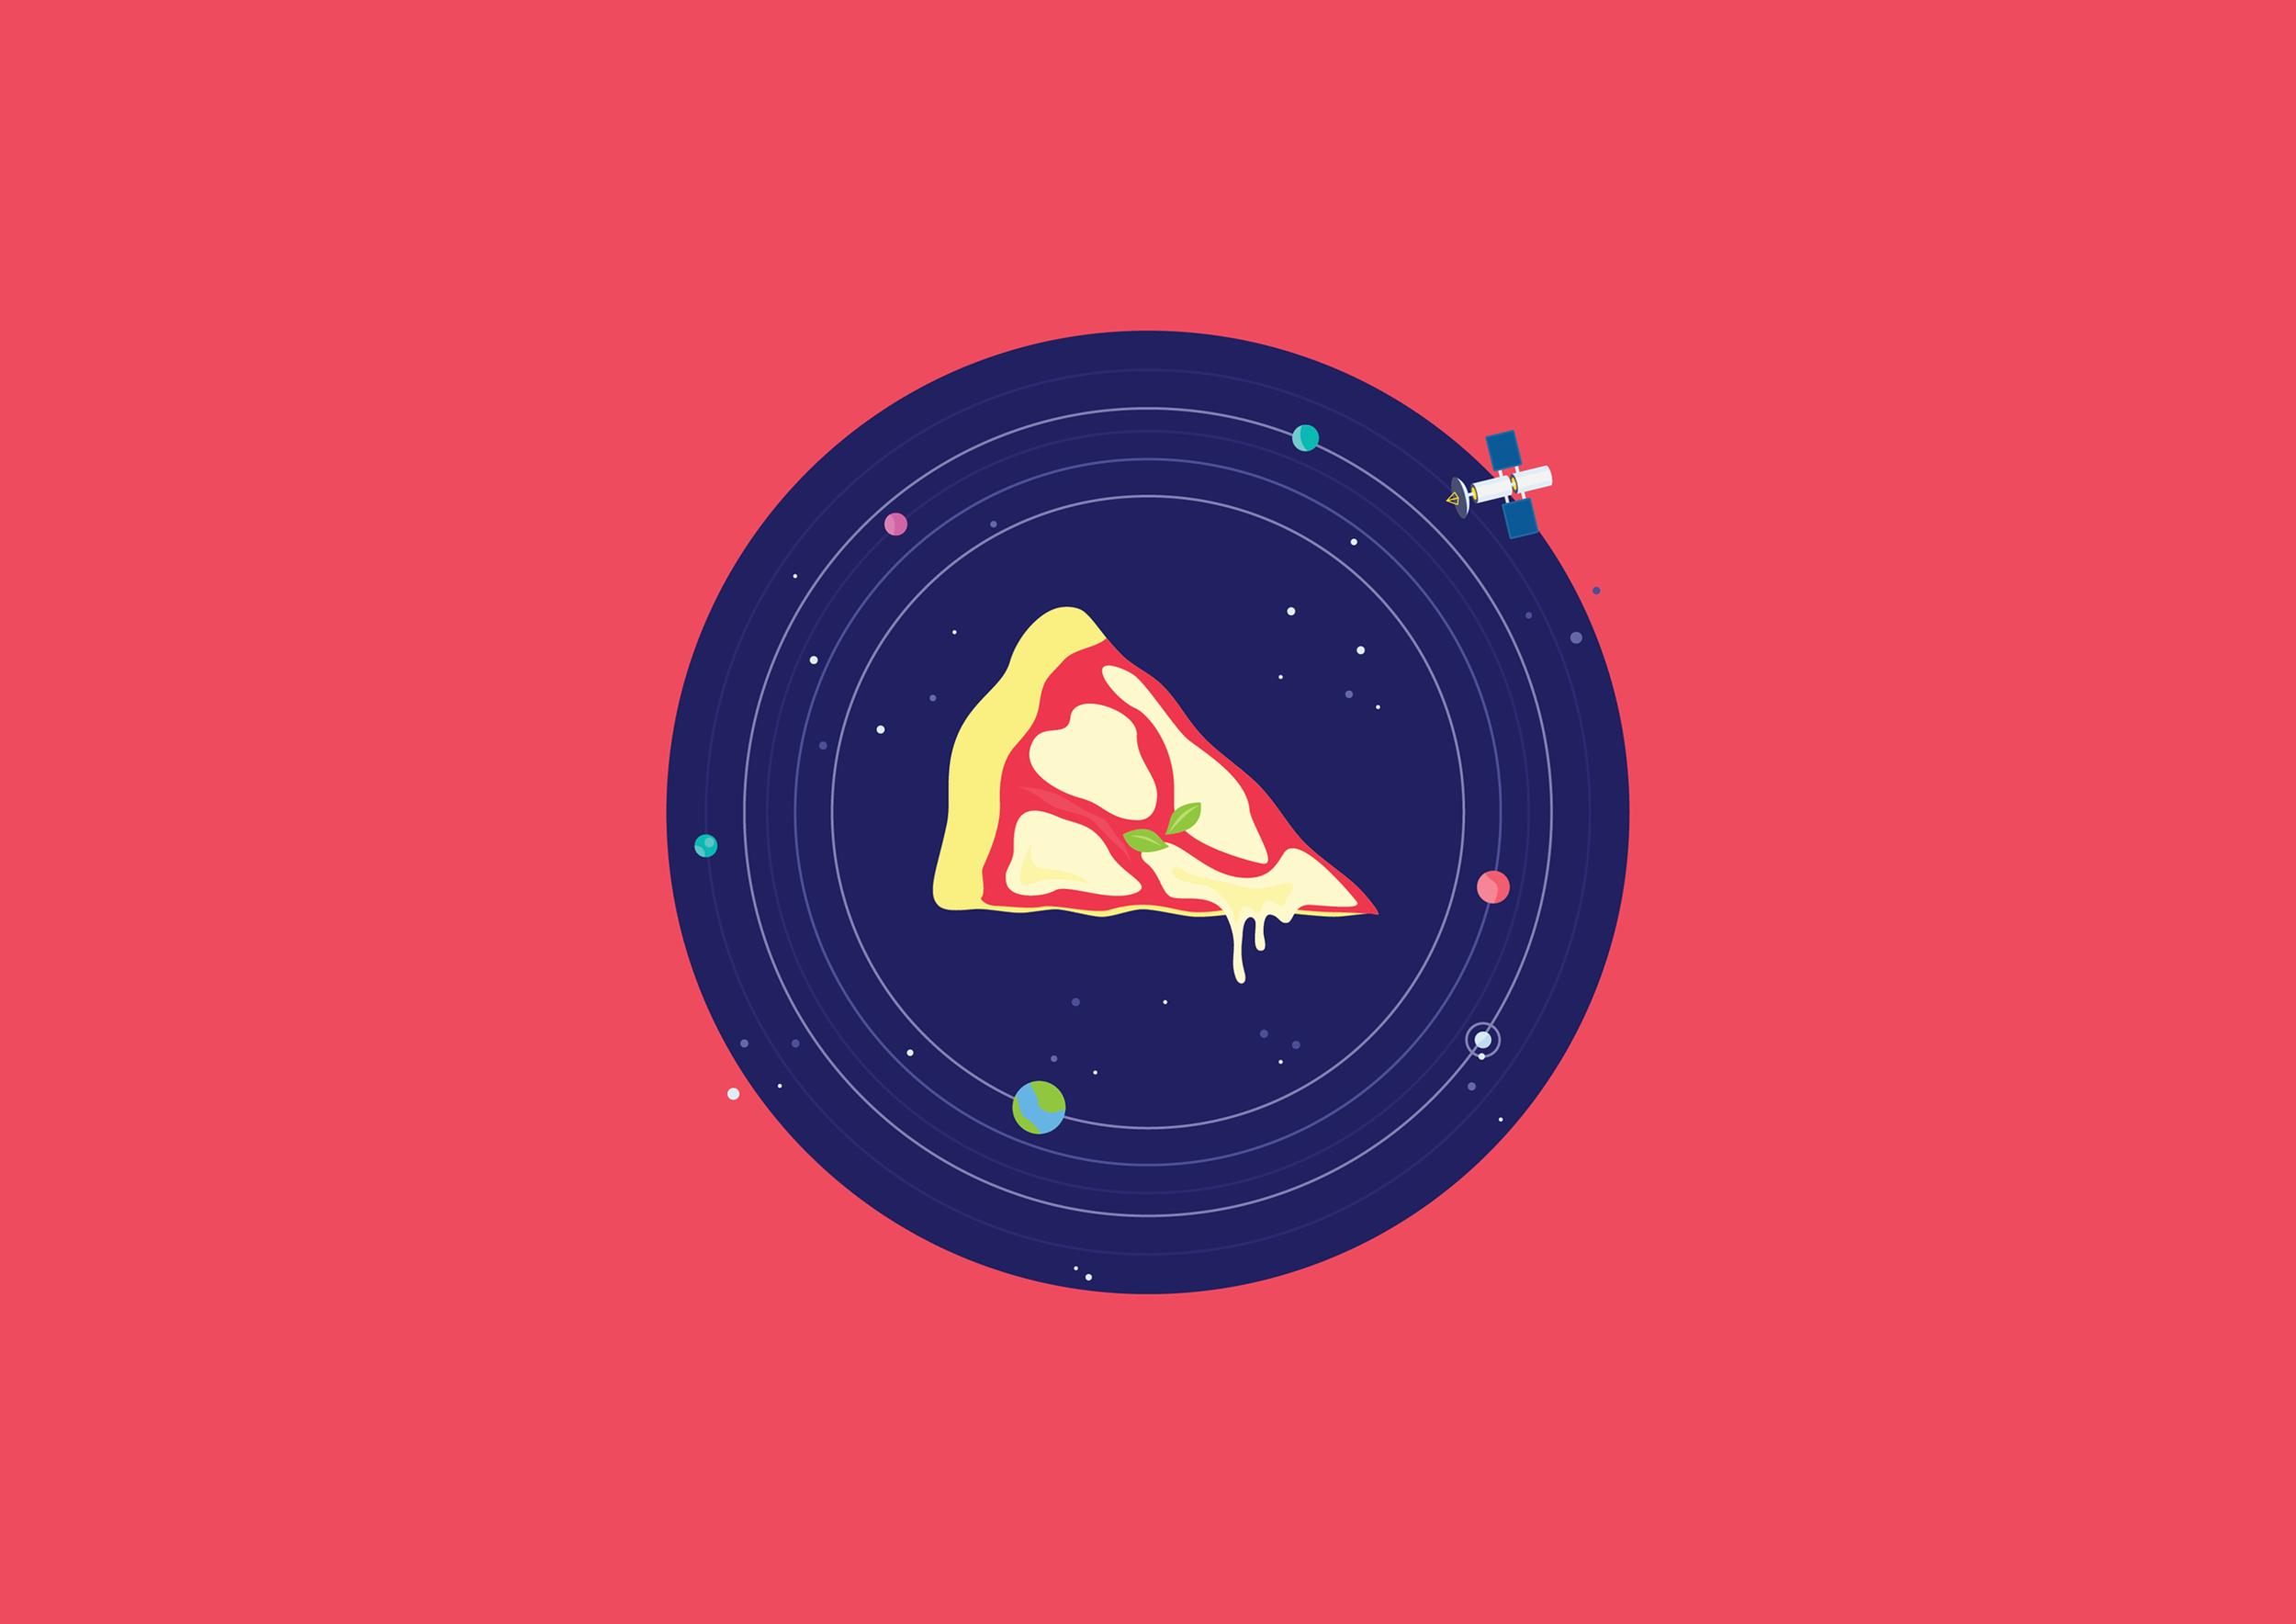 Jessica_Ardizzone_pizza-03.png